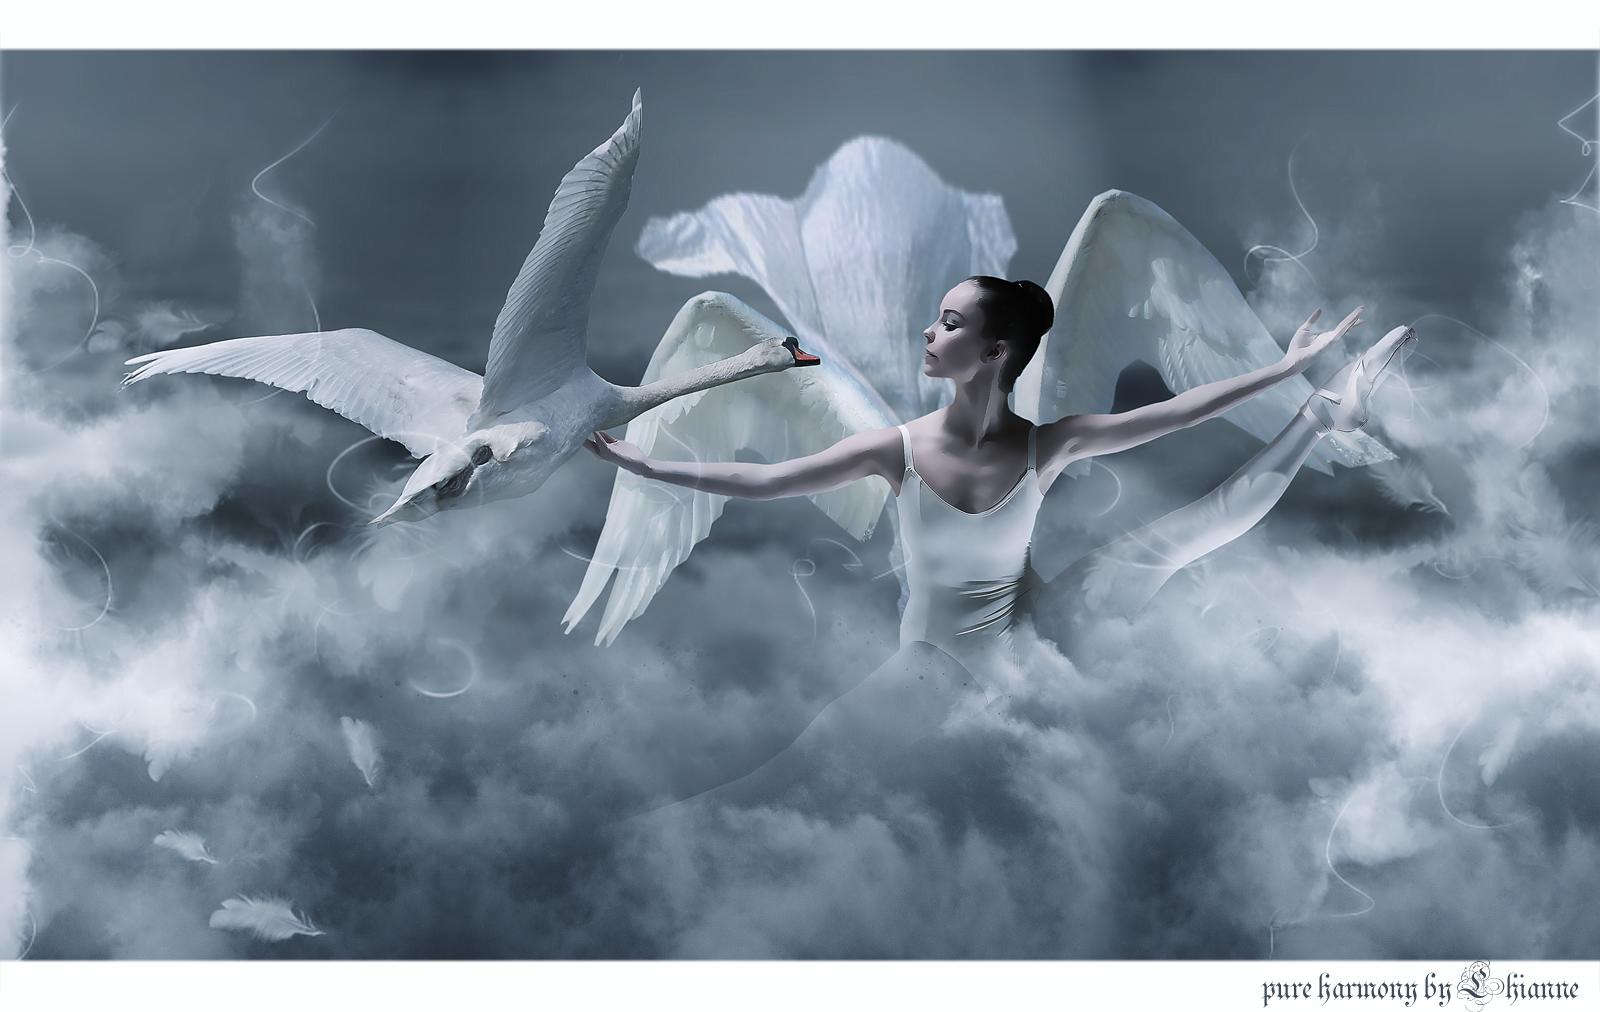 pure harmony by Lhianne